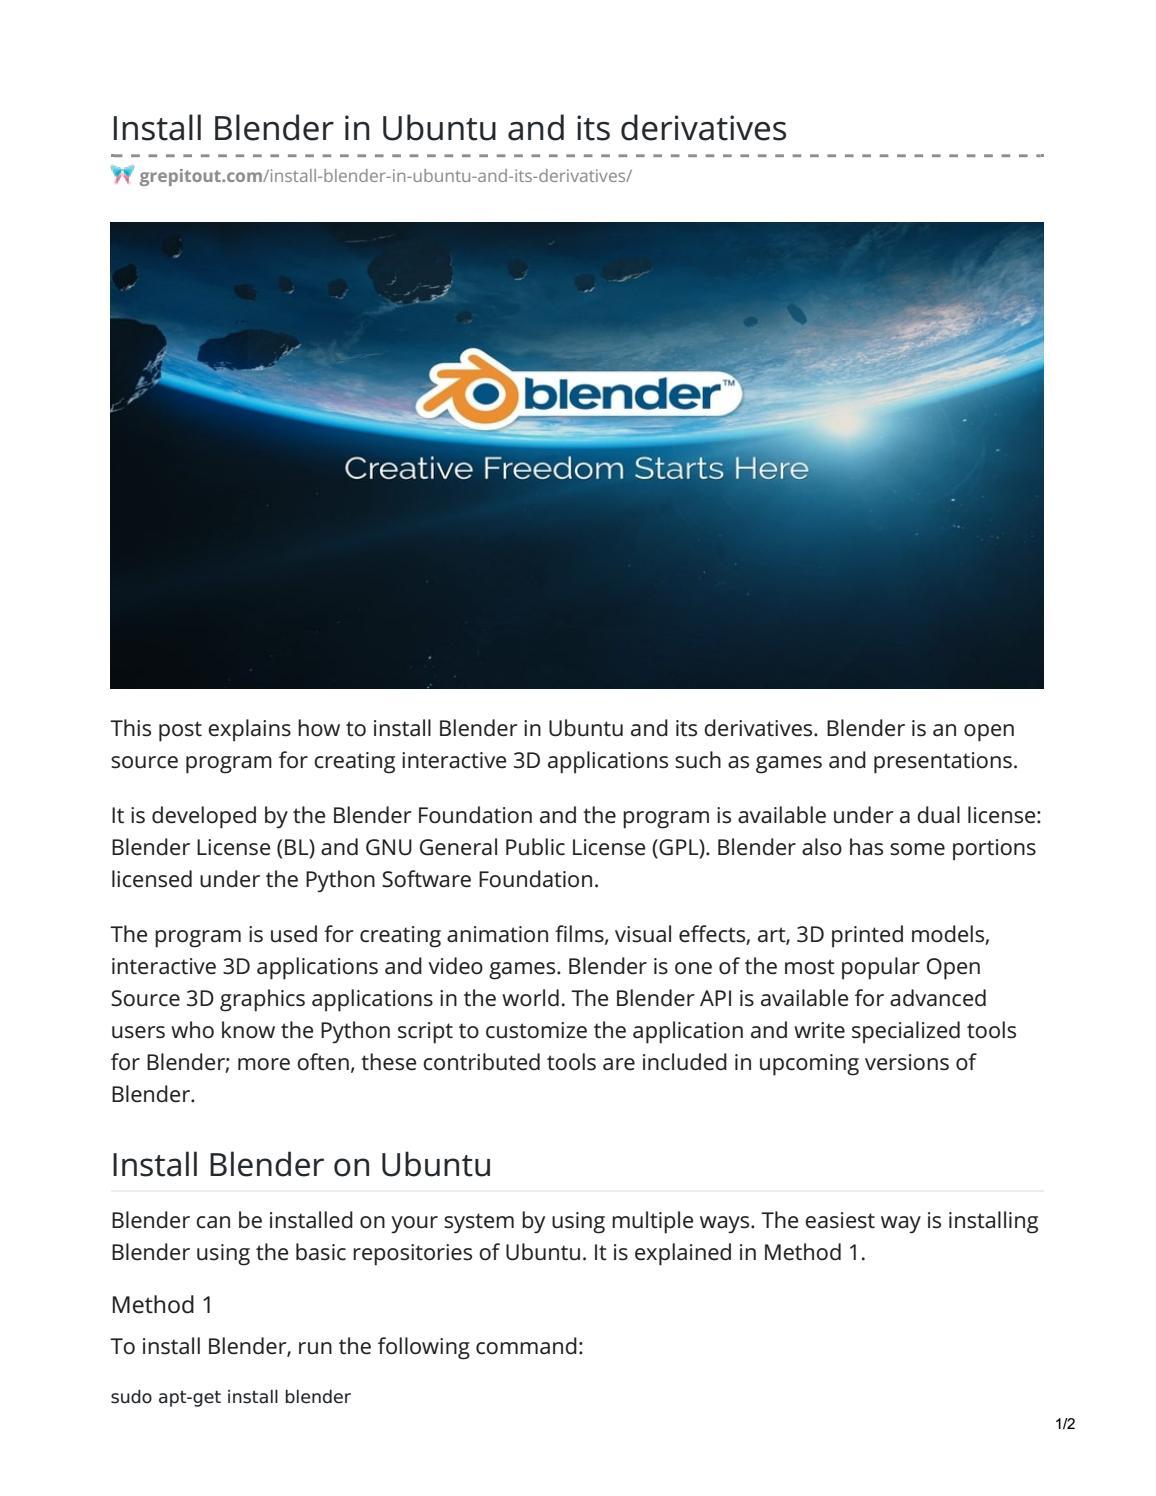 Install Blender in Ubuntu and its derivatives by zainsandina